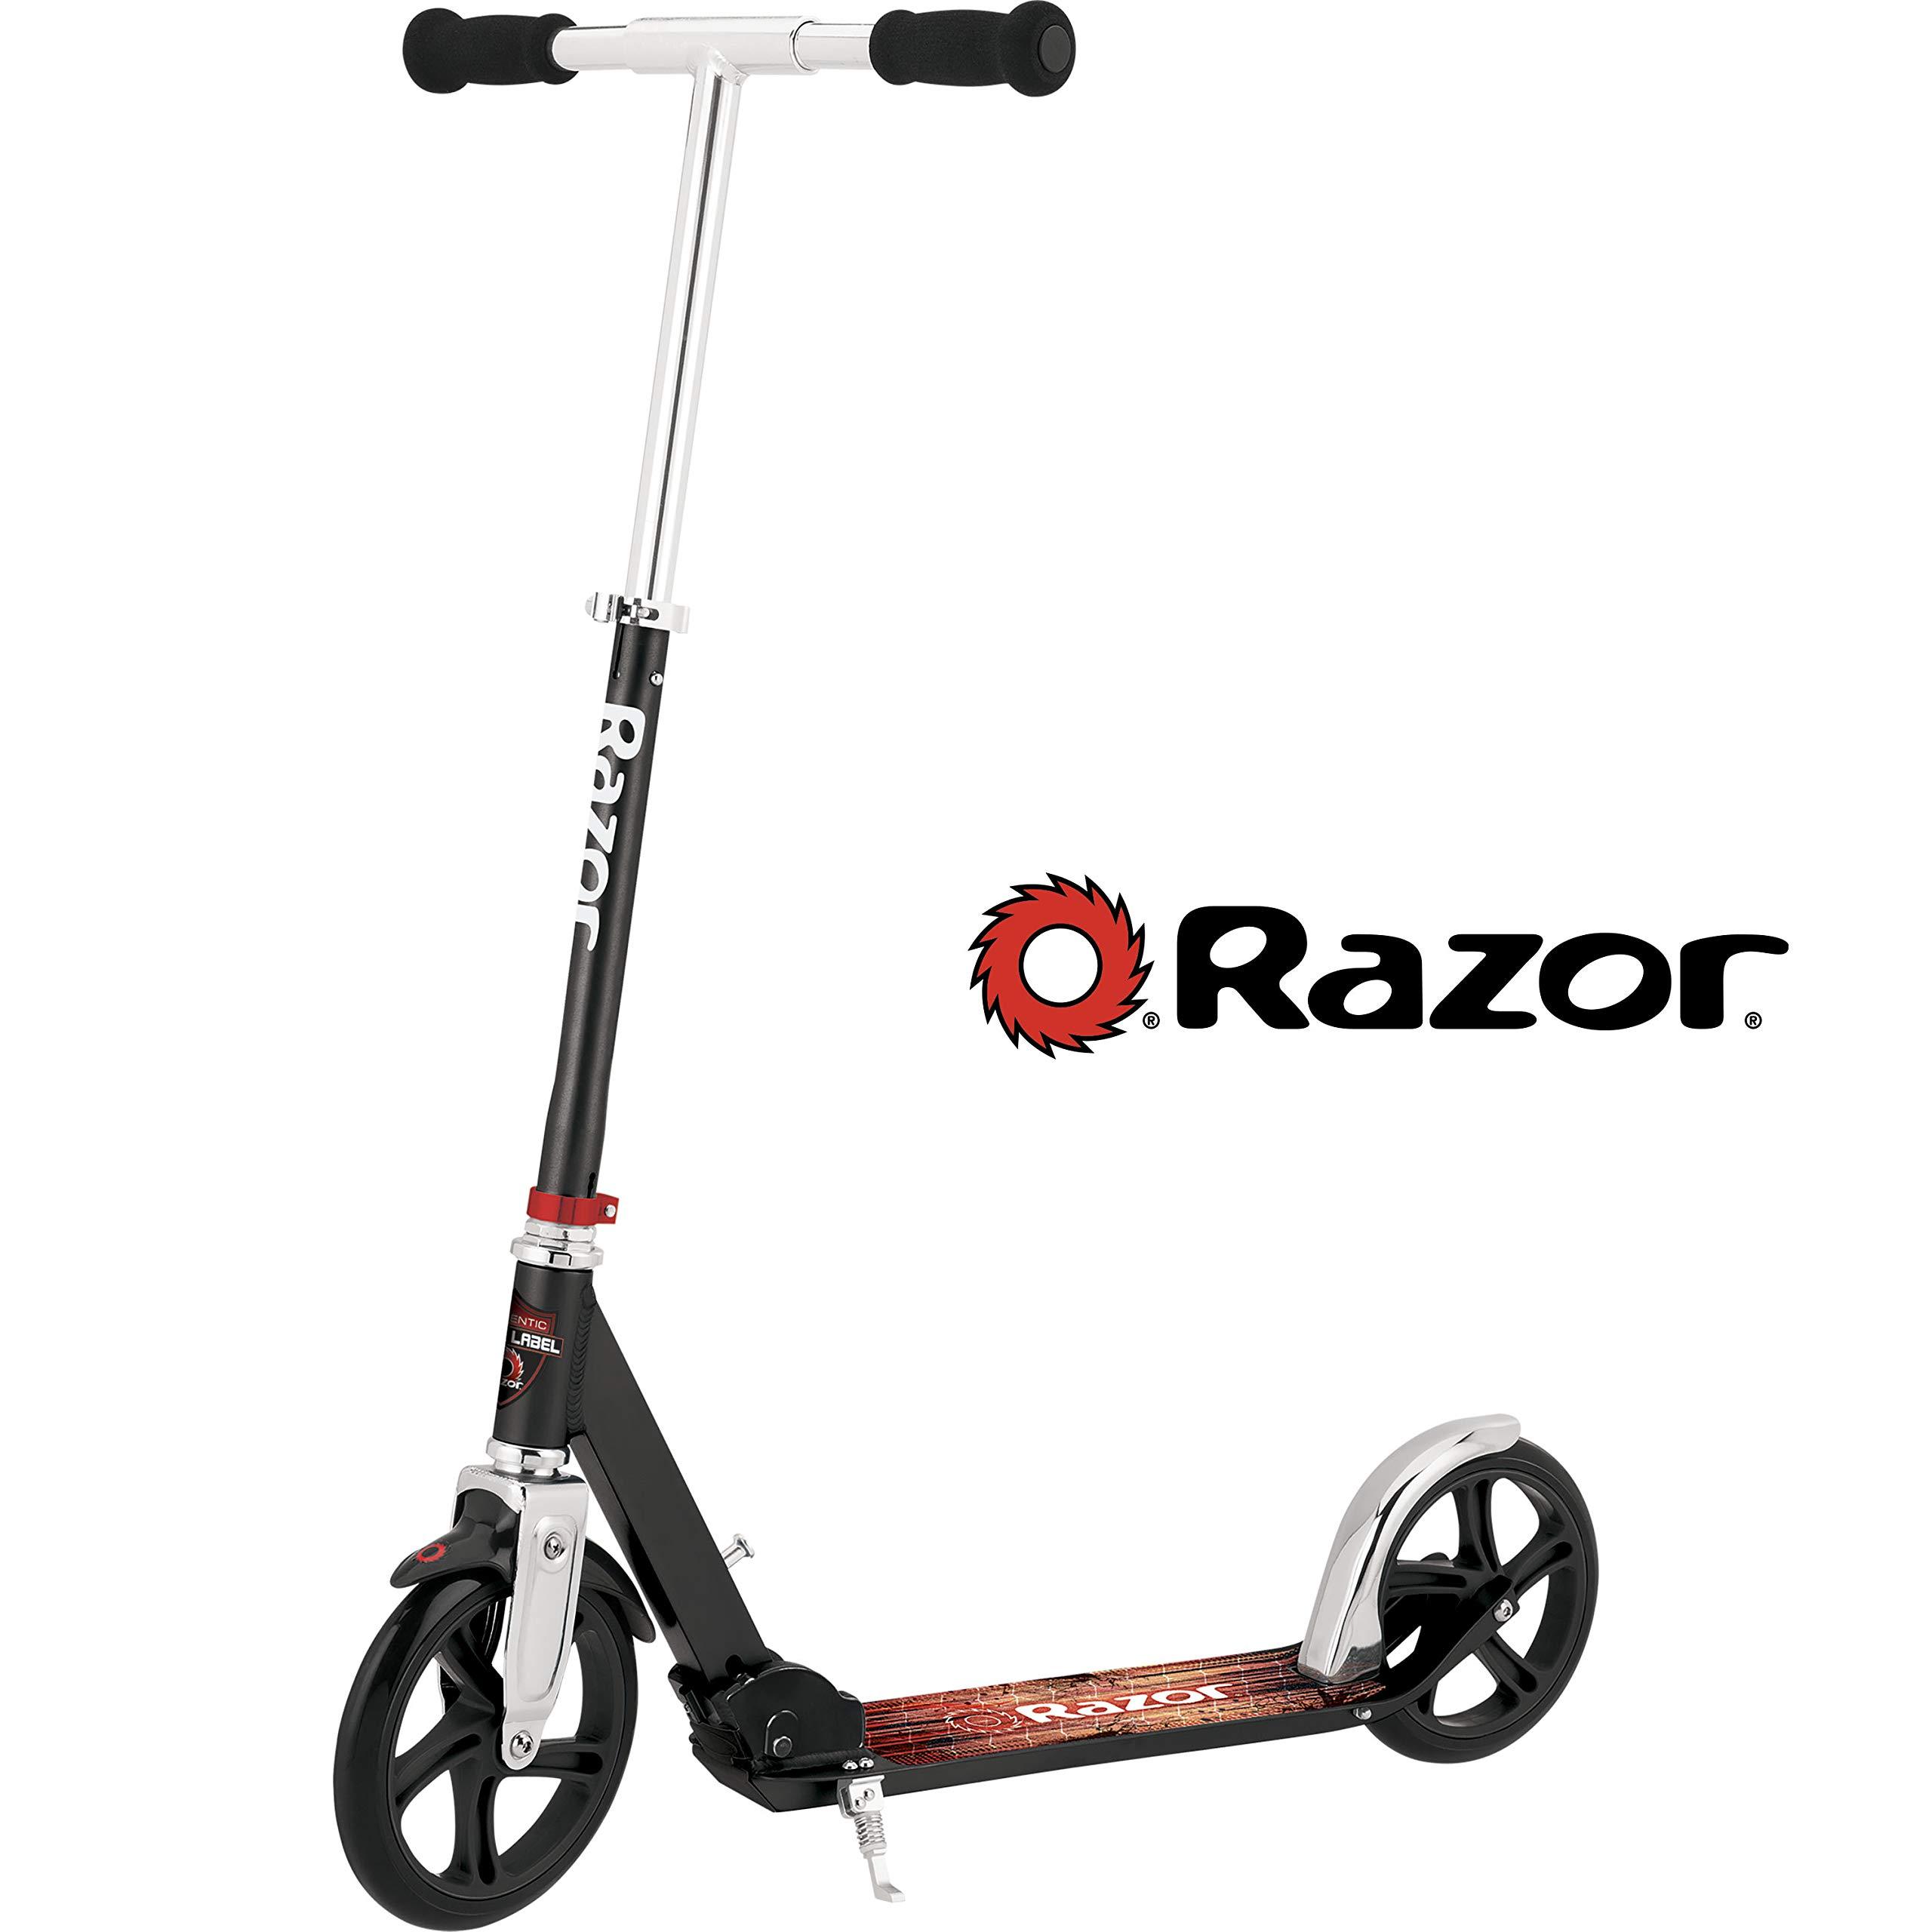 Razor A5 LUX Kick Scooter - Black Label by Razor